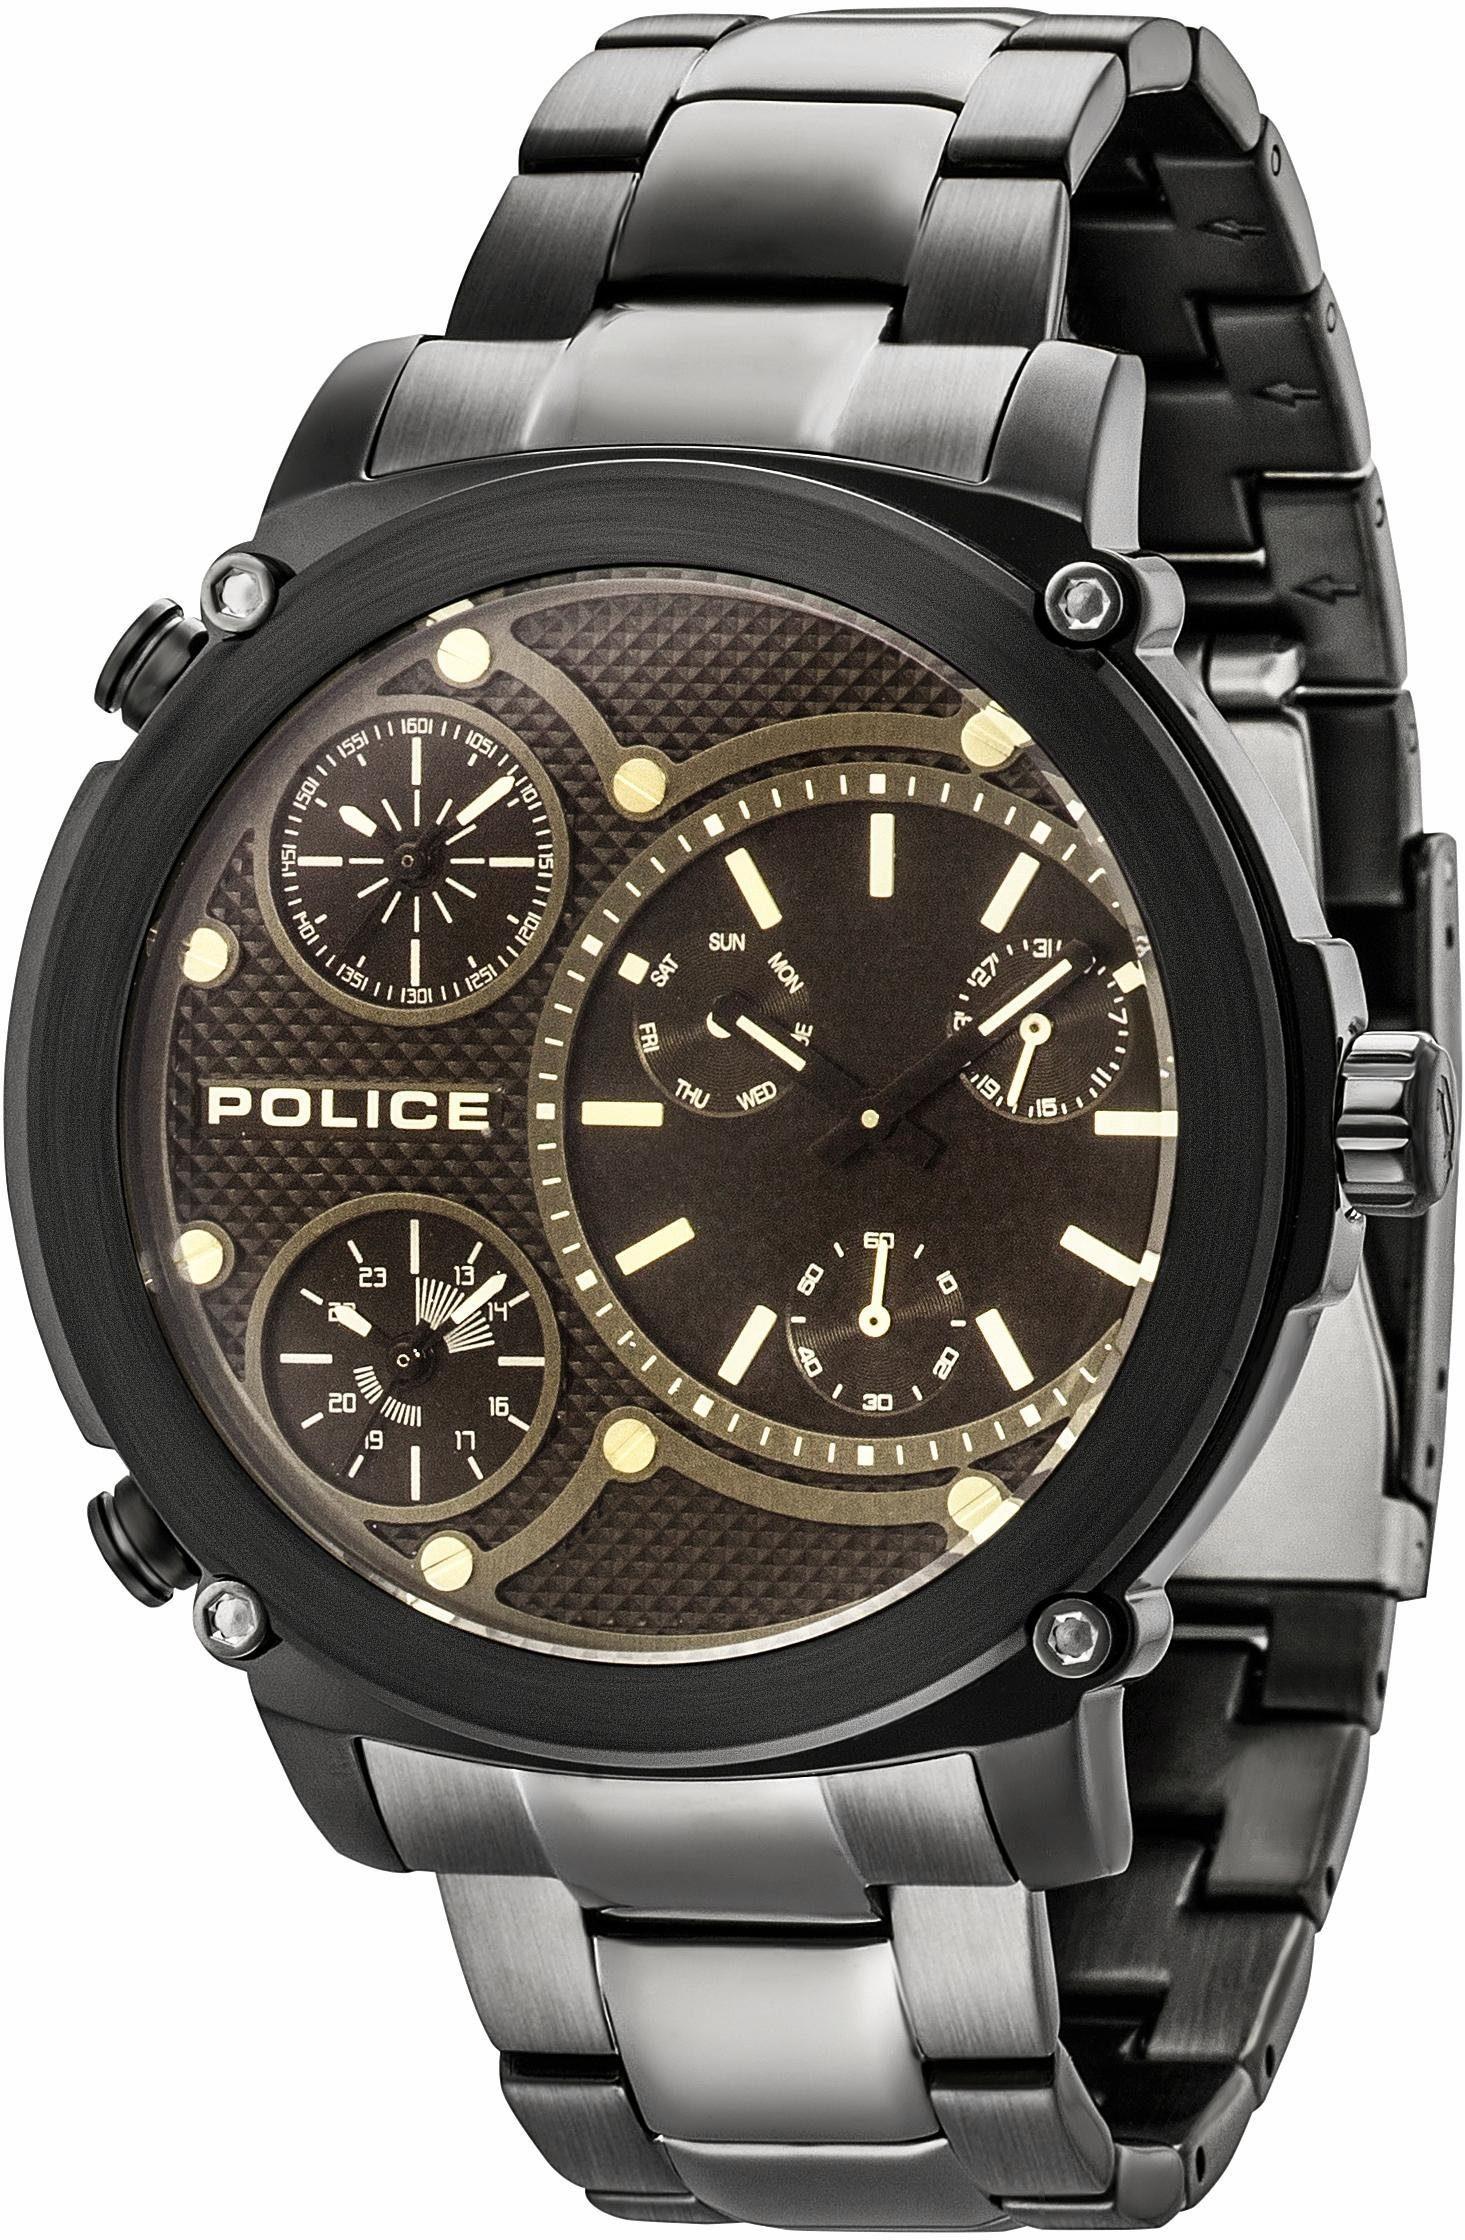 Police Chronograph »TITAN, PL14830JSB.02M«